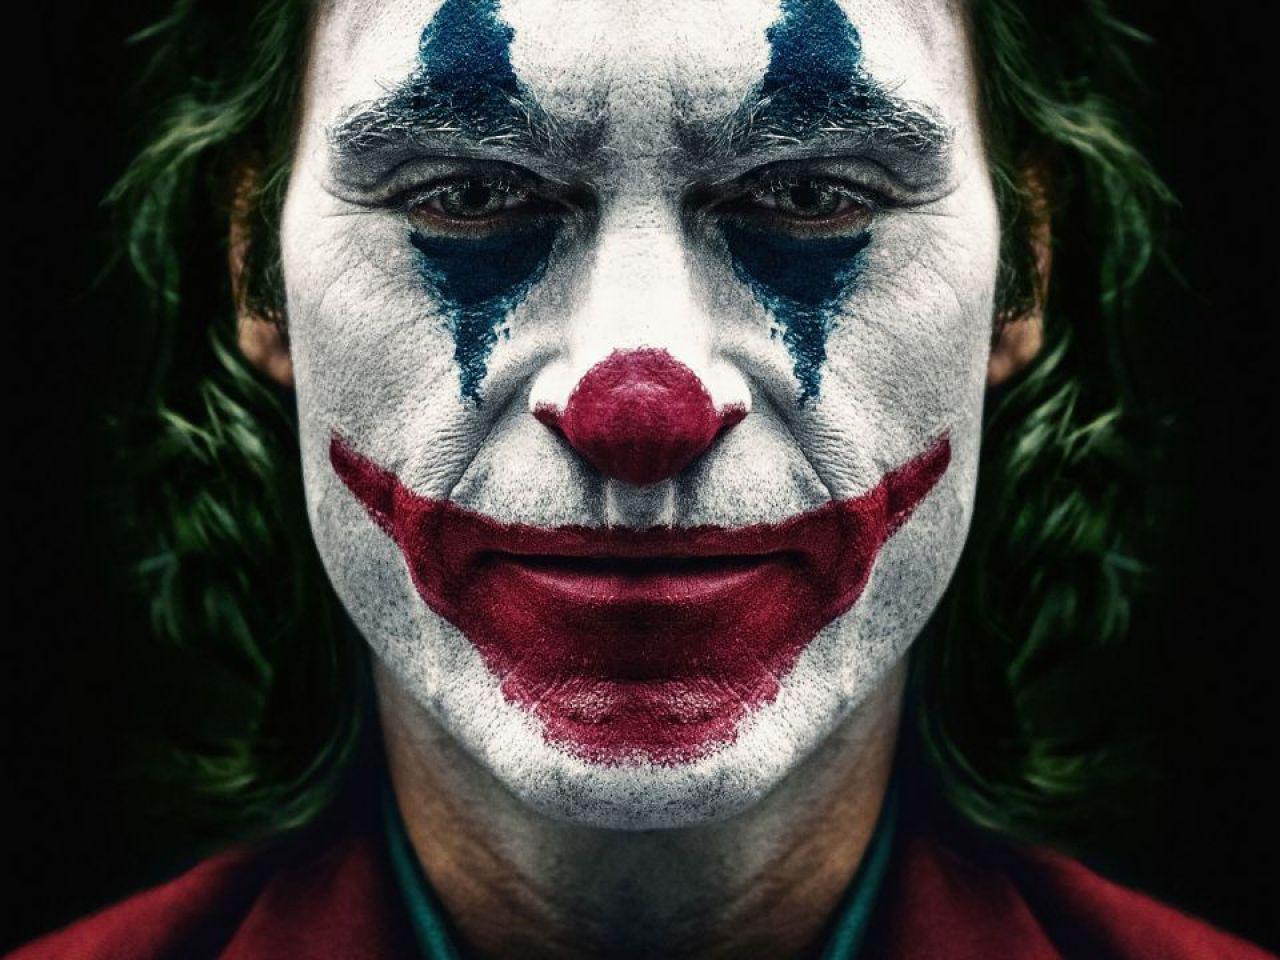 Joker 2 – Joaquin Phoenix lascia la porta aperta per un possibile sequel